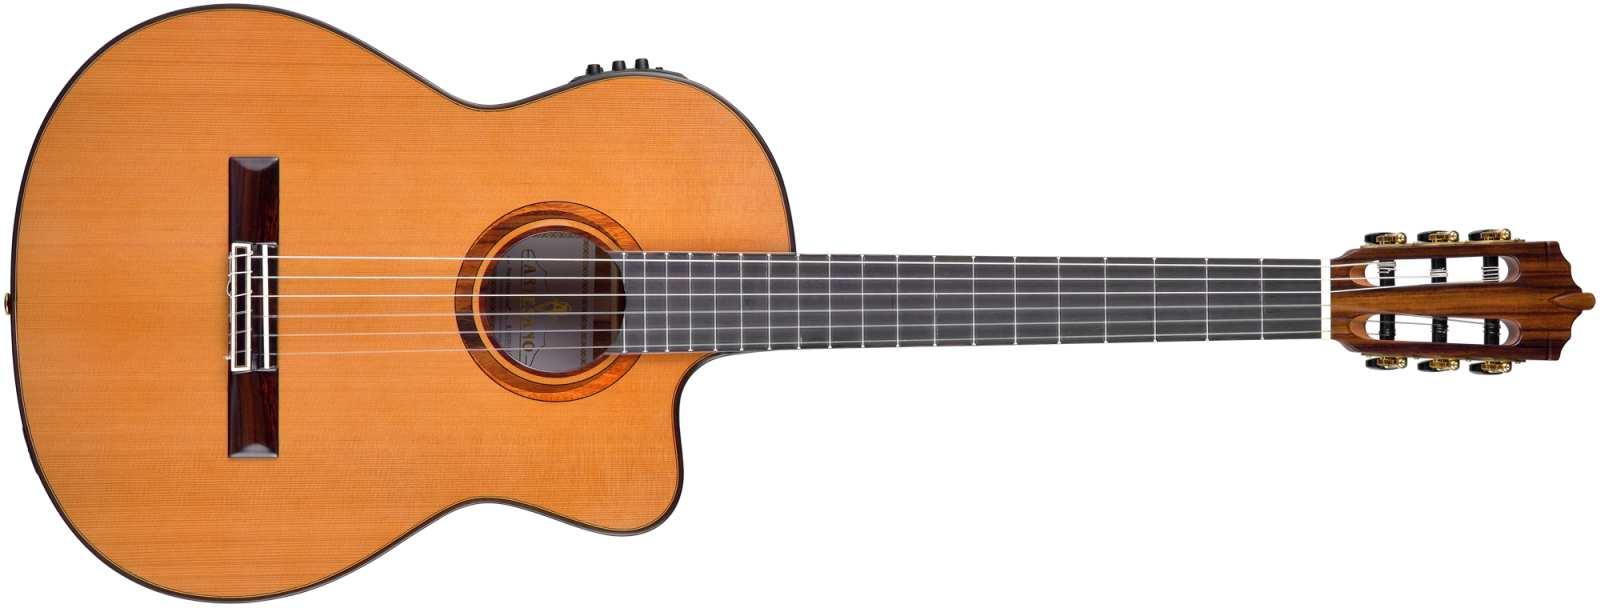 Artesano Nuevo Marron Cut Konzertgitarre